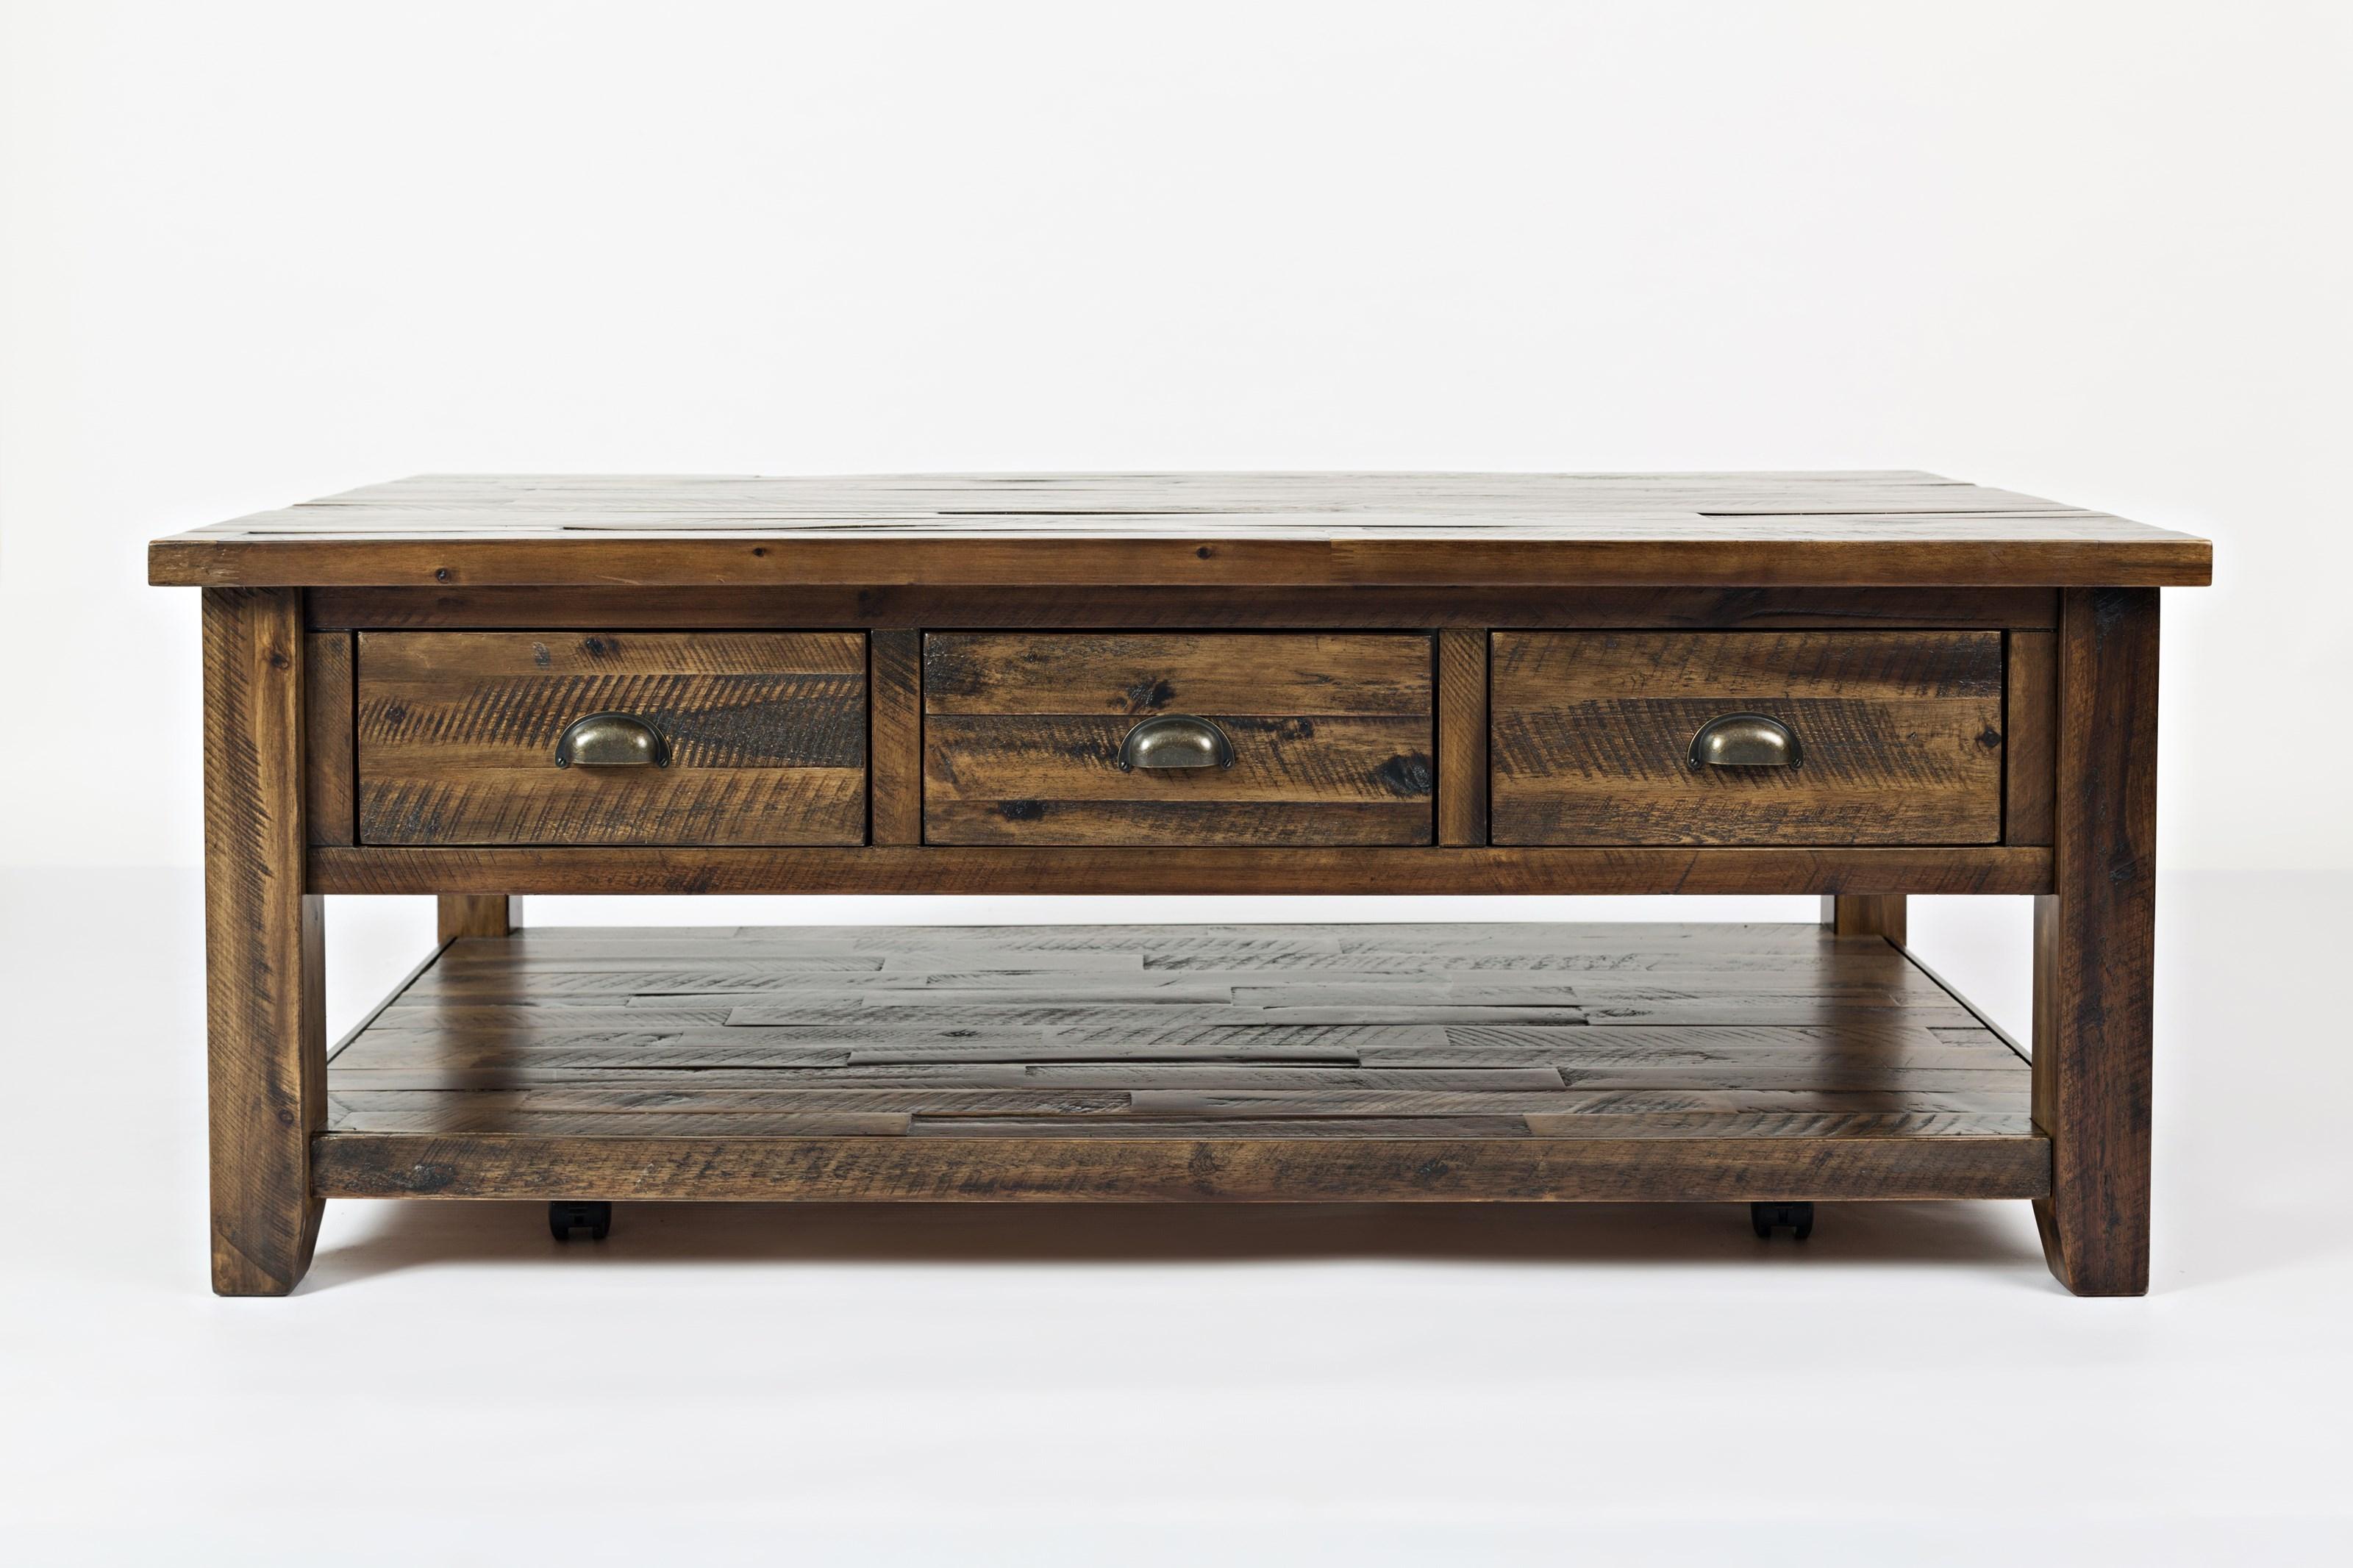 Artisan's Craft Cocktail Table by Jofran at Lapeer Furniture & Mattress Center